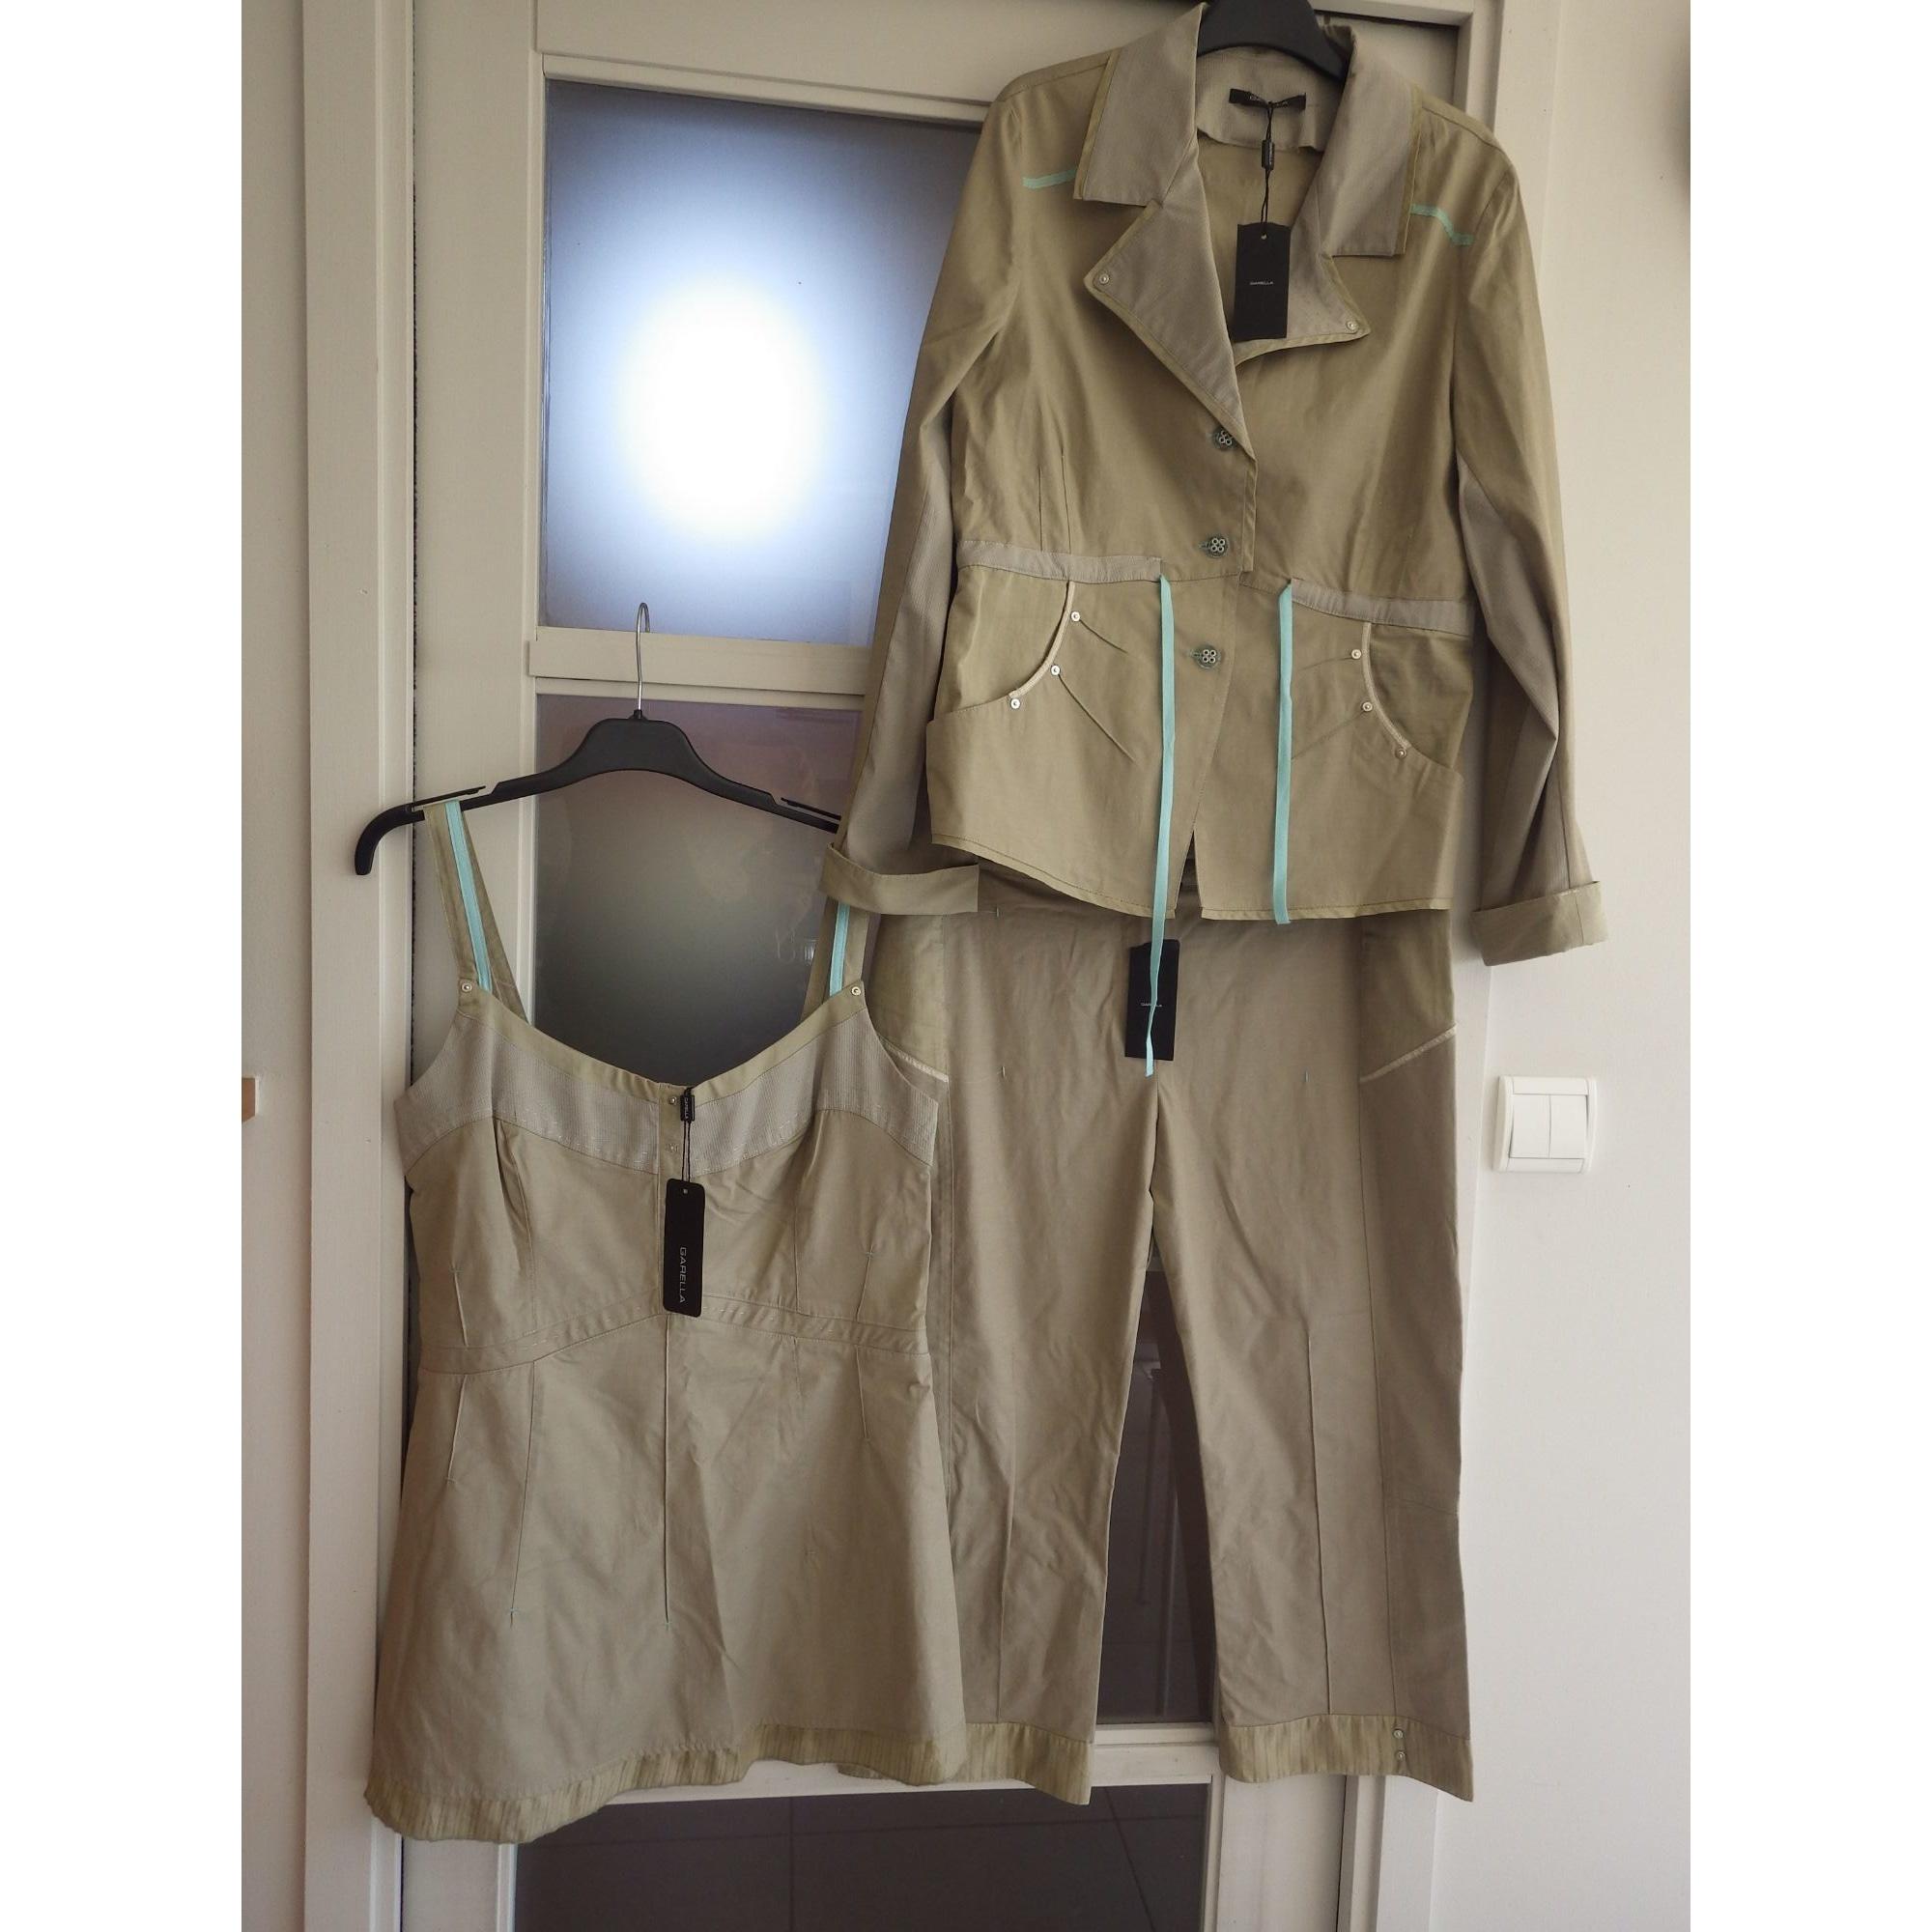 Tailleur pantalon GARELLA Beige, camel